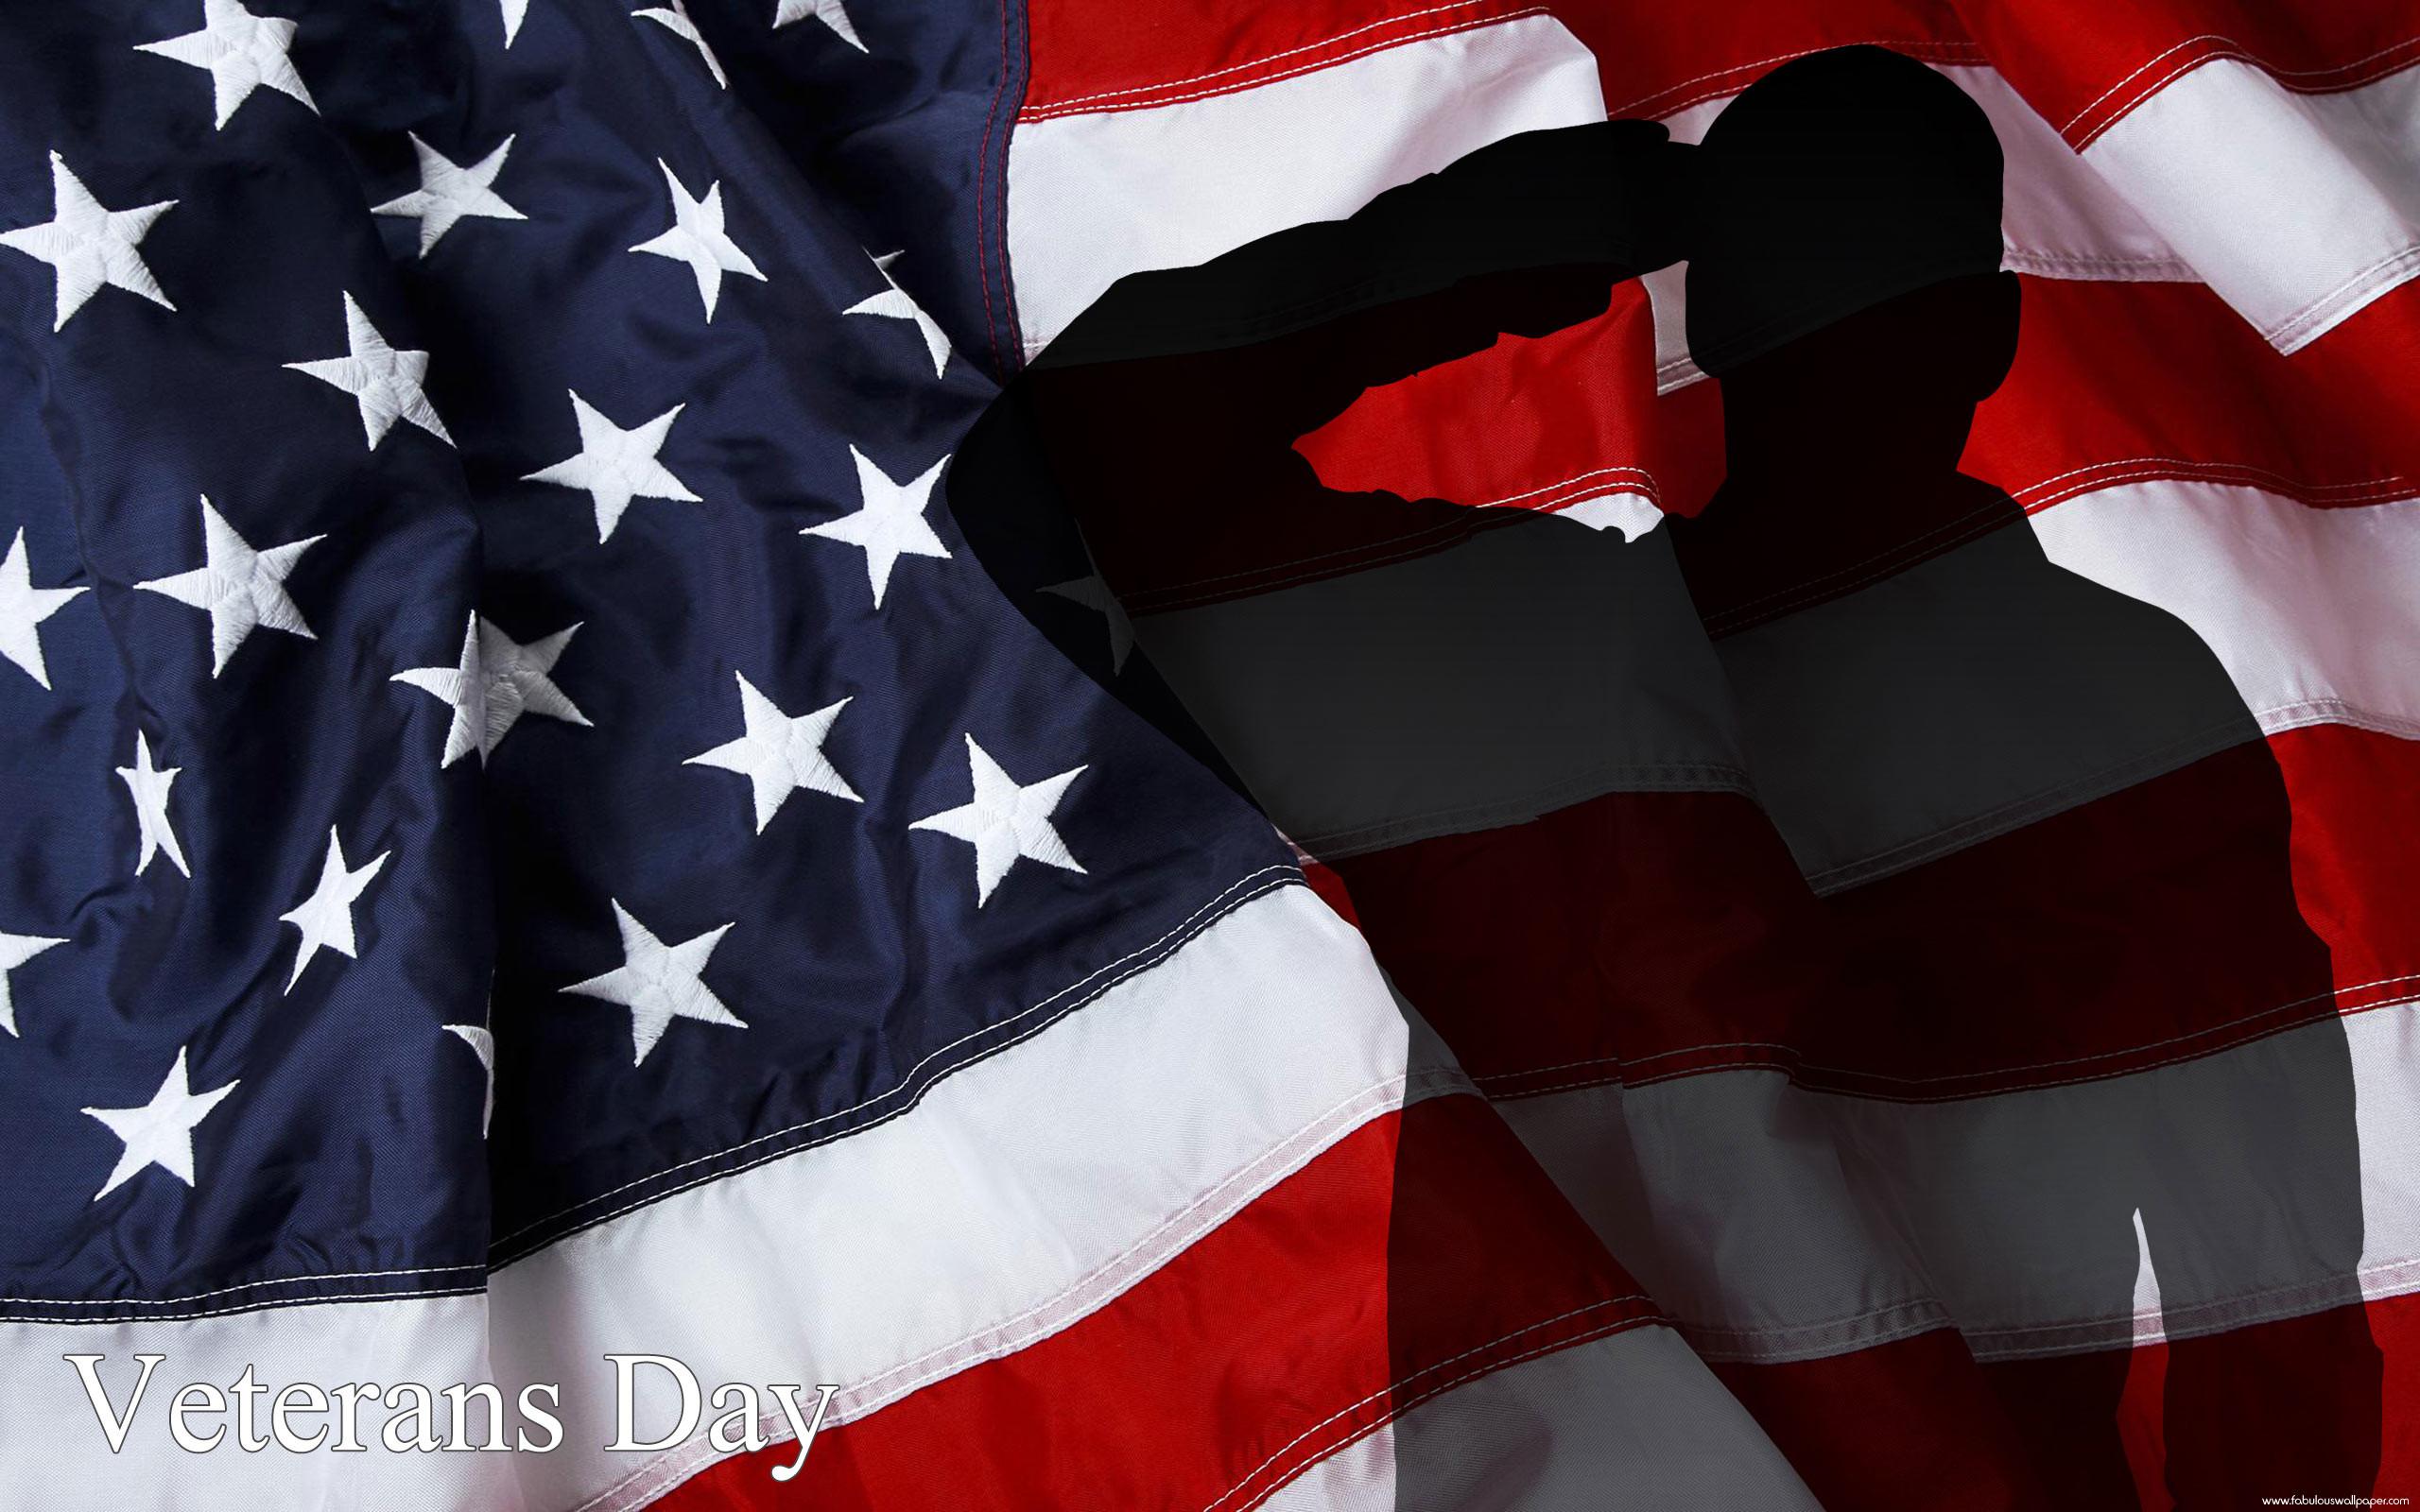 Veterans Day Wallpaper 1